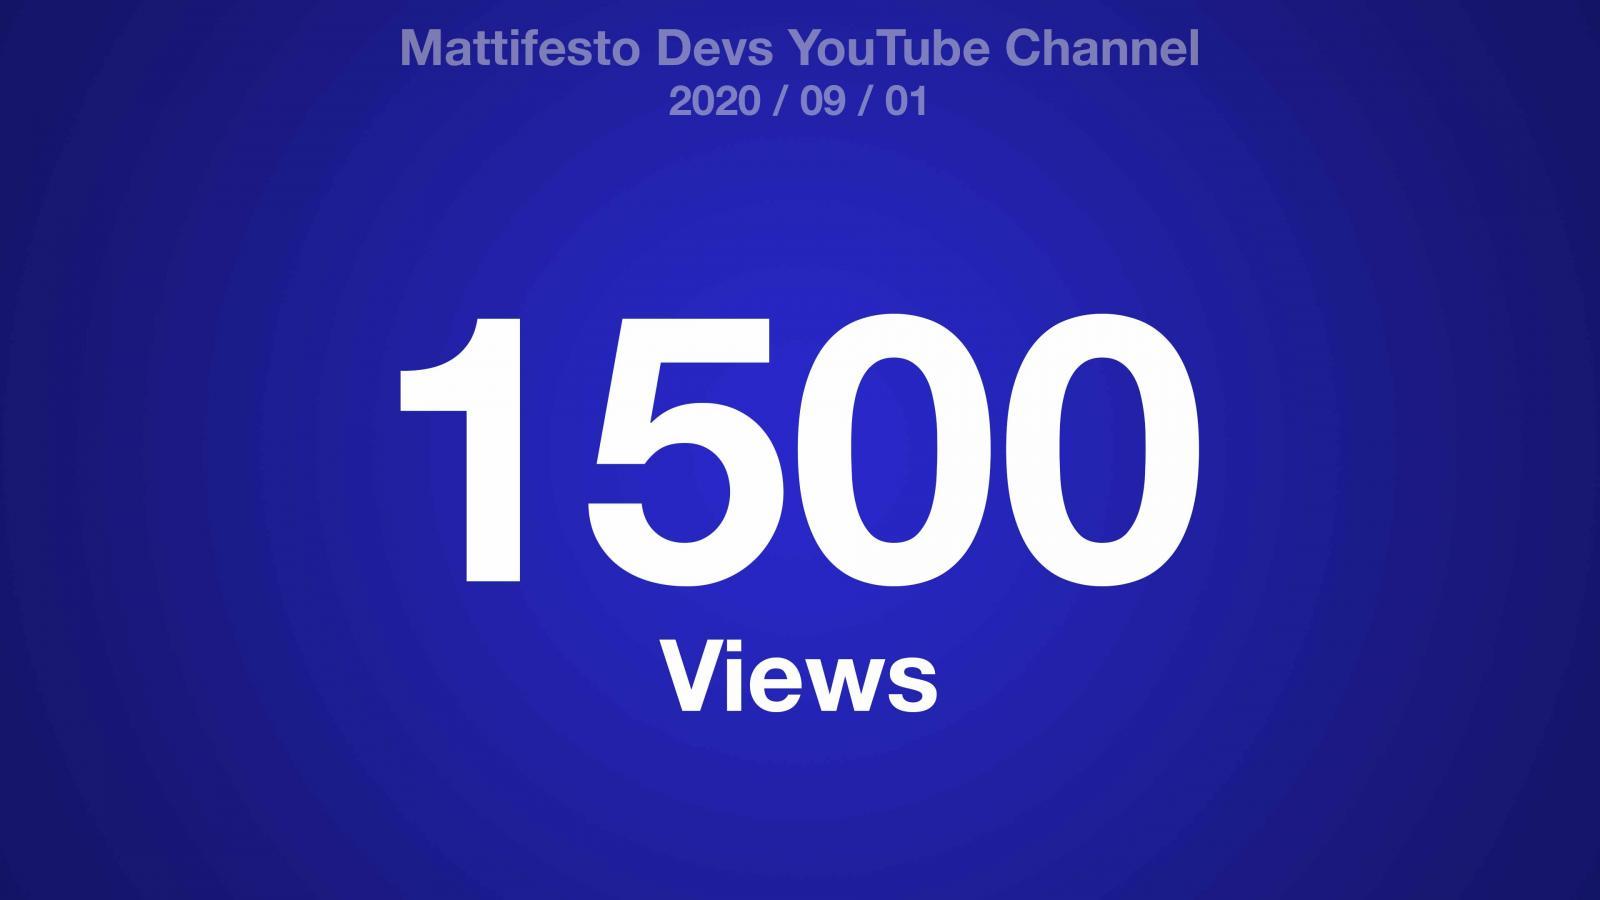 A blue radial gradient with white text: Mattifesto Devs YouTube Channel 2020/09/01 1500 Views